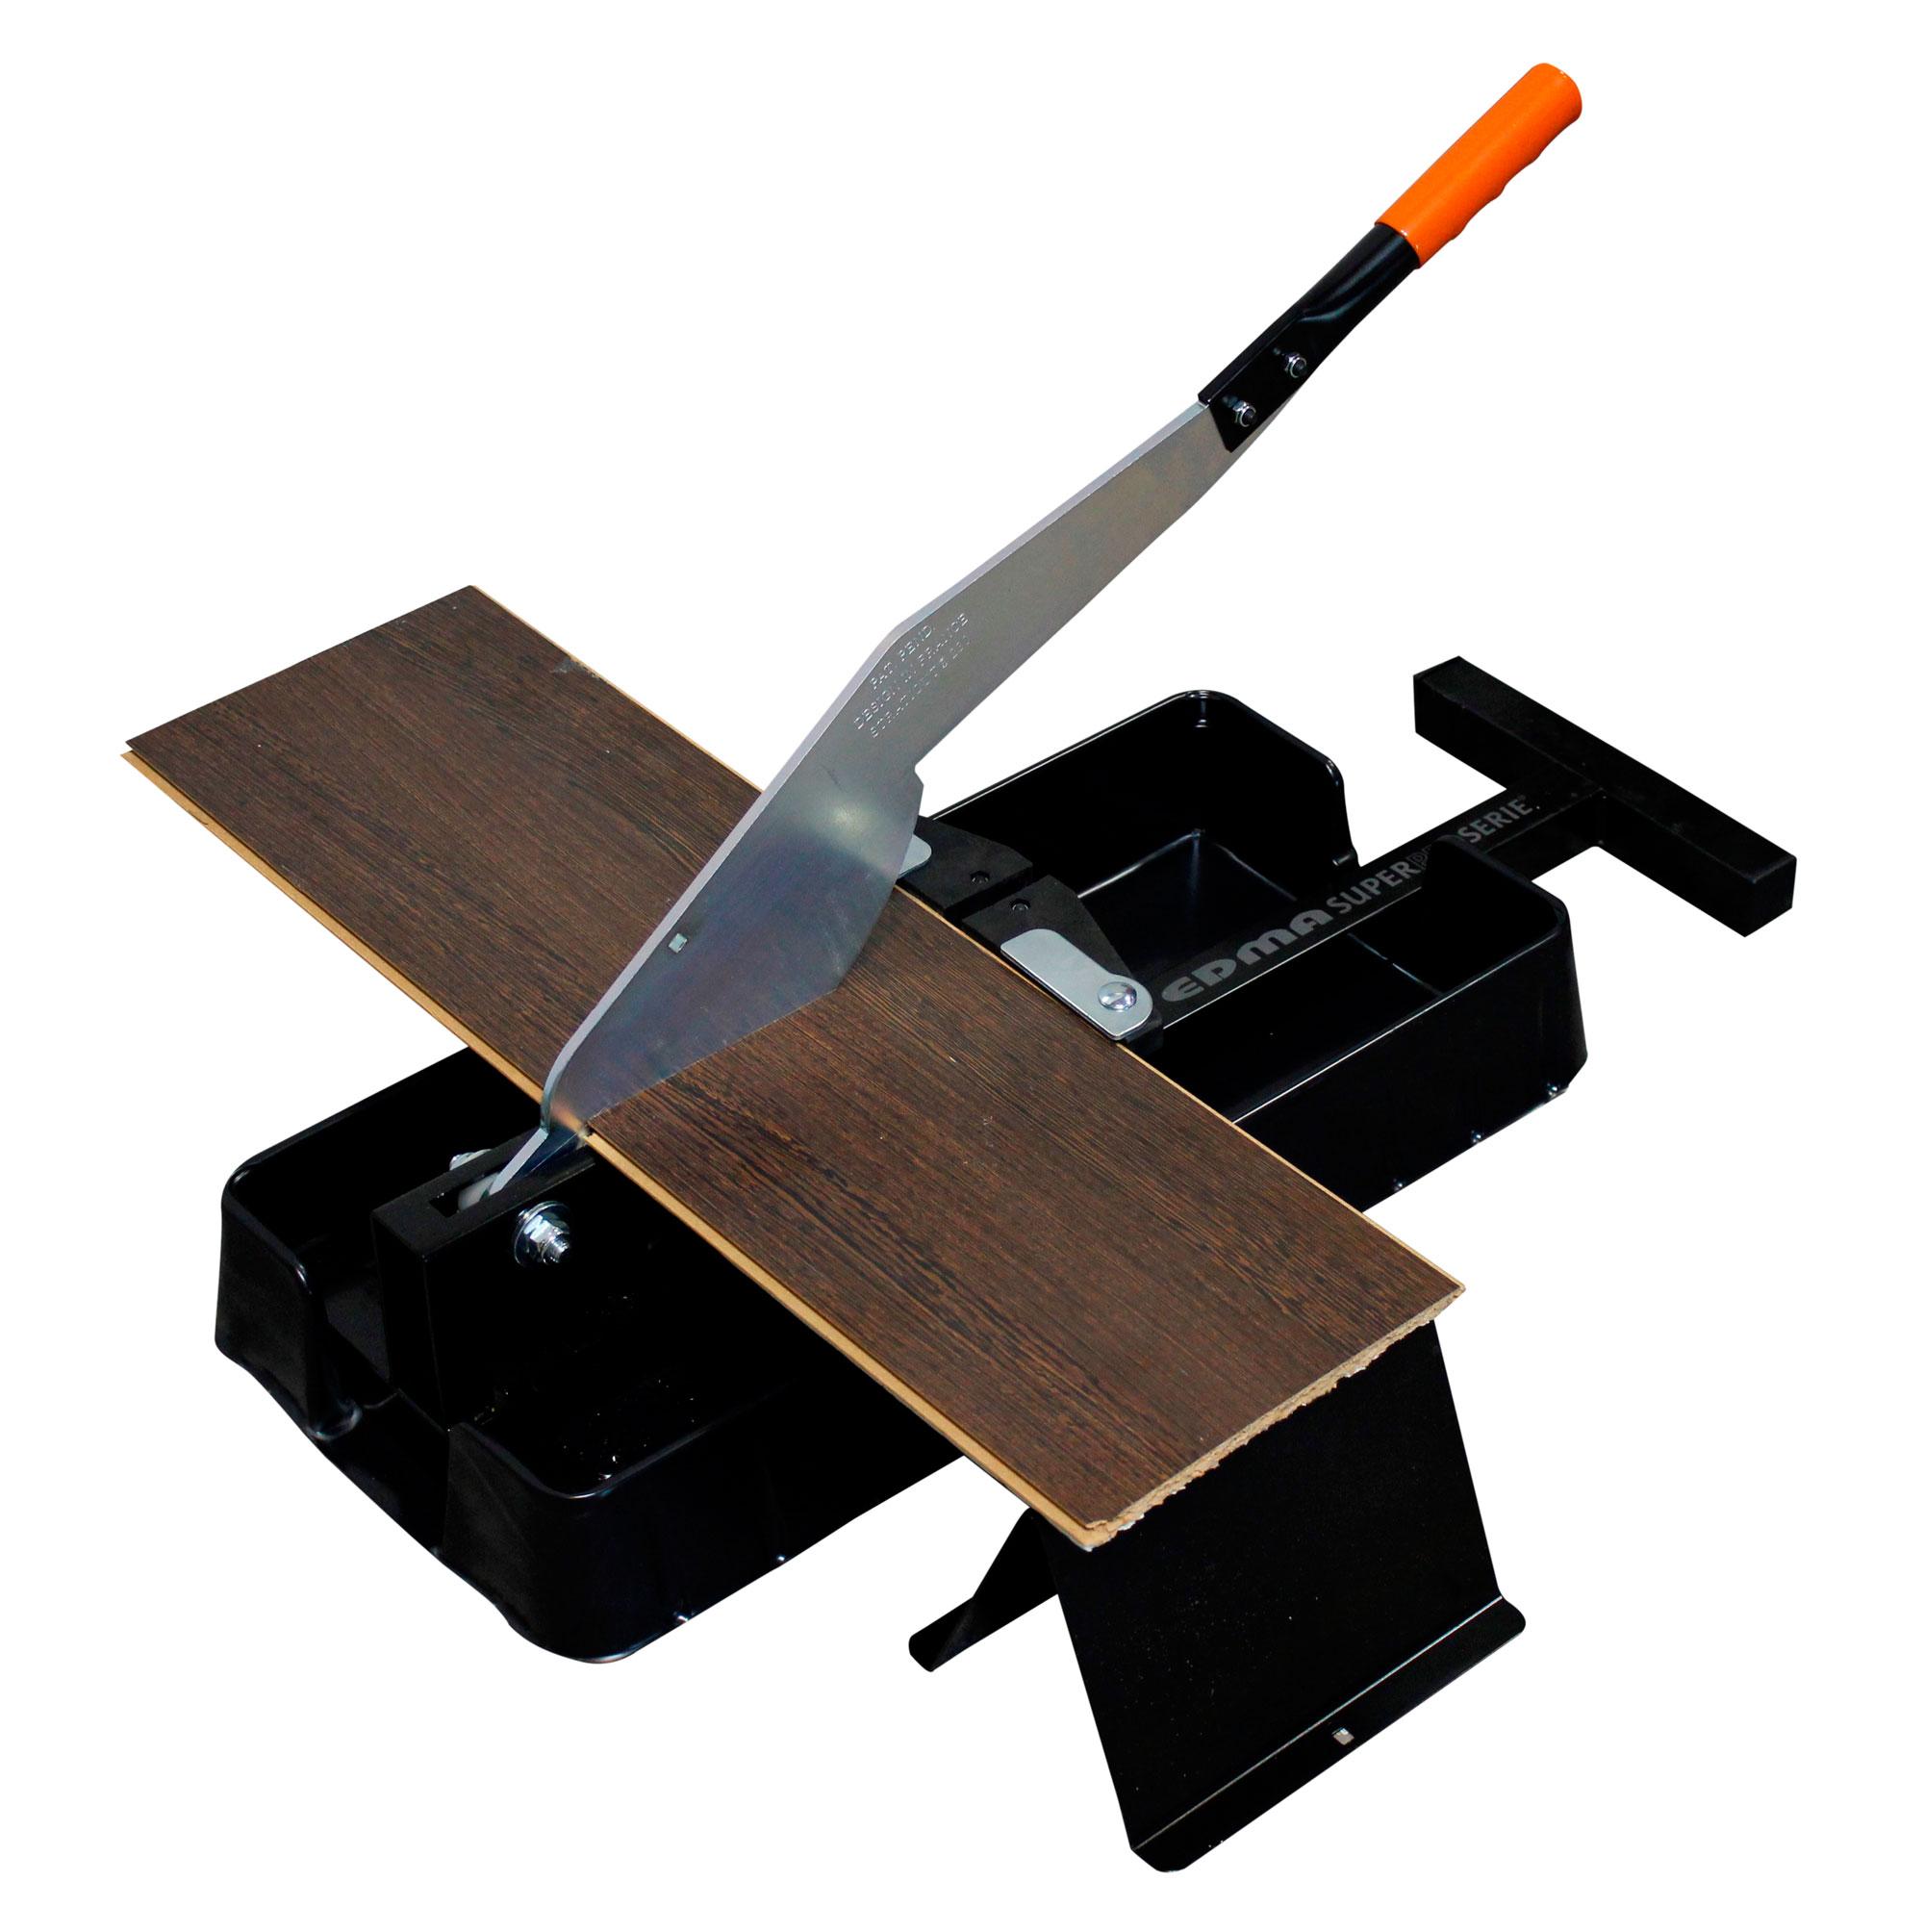 guillotine professionnelle coupe parquet sol stratifi straticut 230 edma krenobat outillage. Black Bedroom Furniture Sets. Home Design Ideas